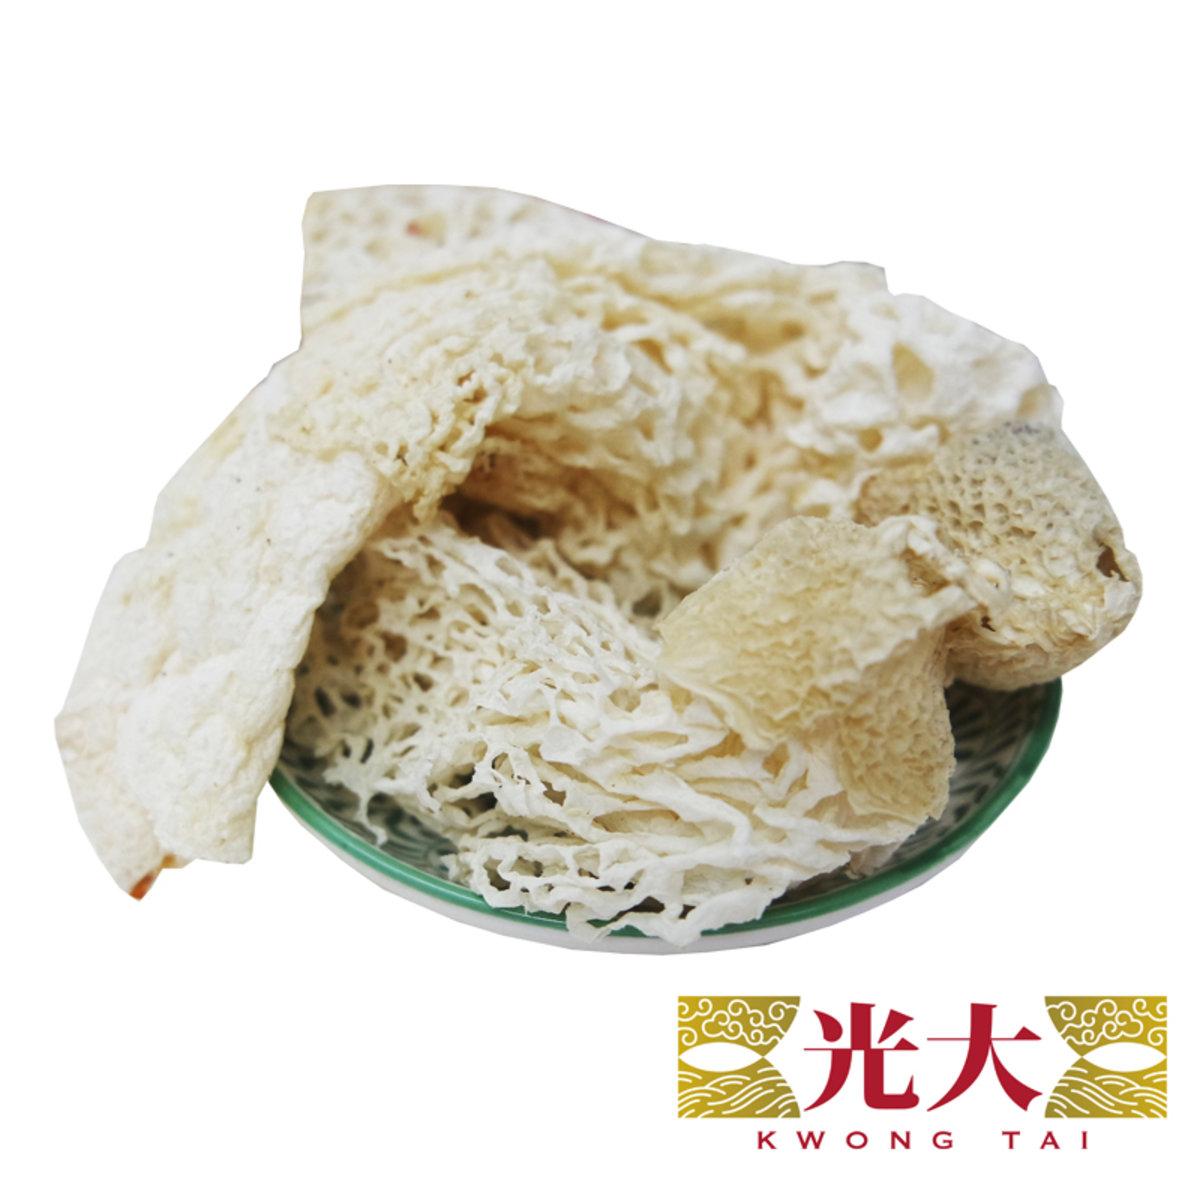 Bamboo Fungus (75g)